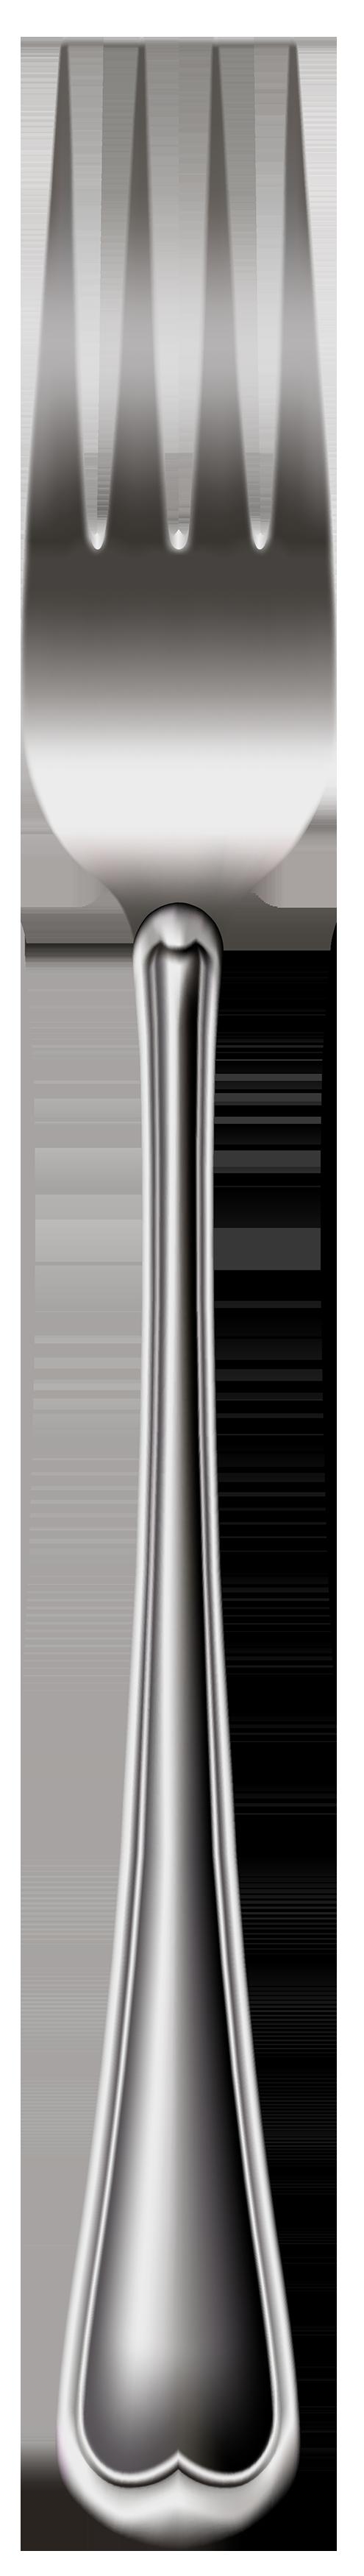 Elegant fork clipart web